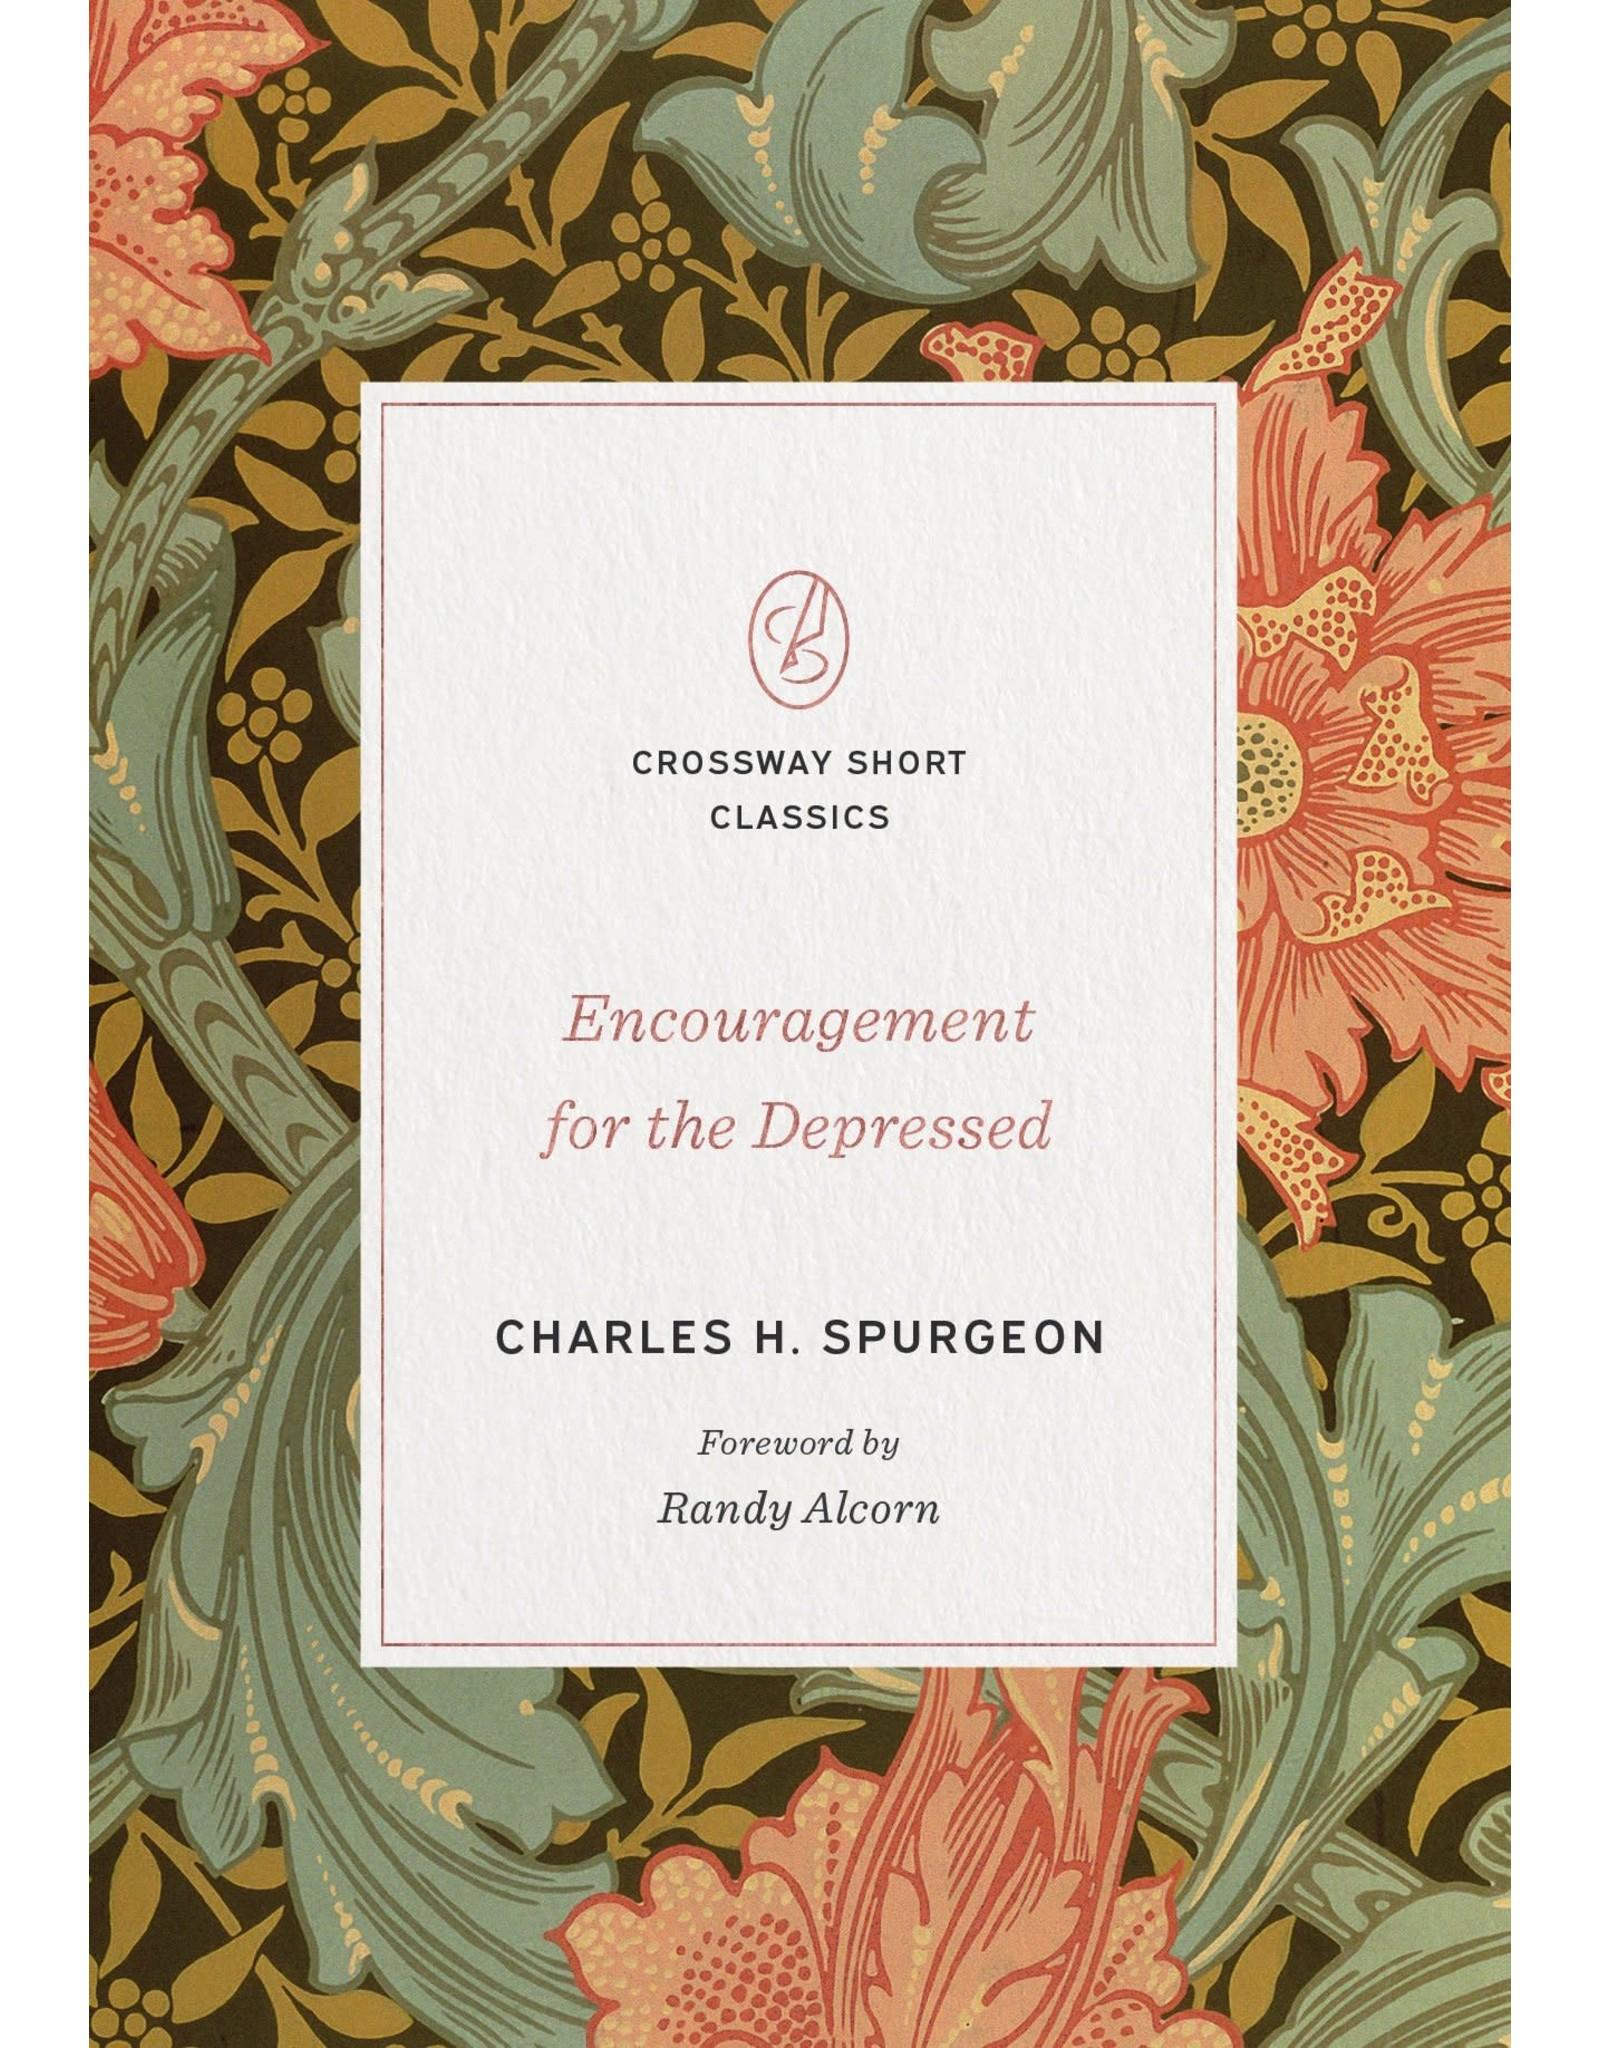 Spurgeon Encouragement for the Depressed (Crossway Short Classics Series)